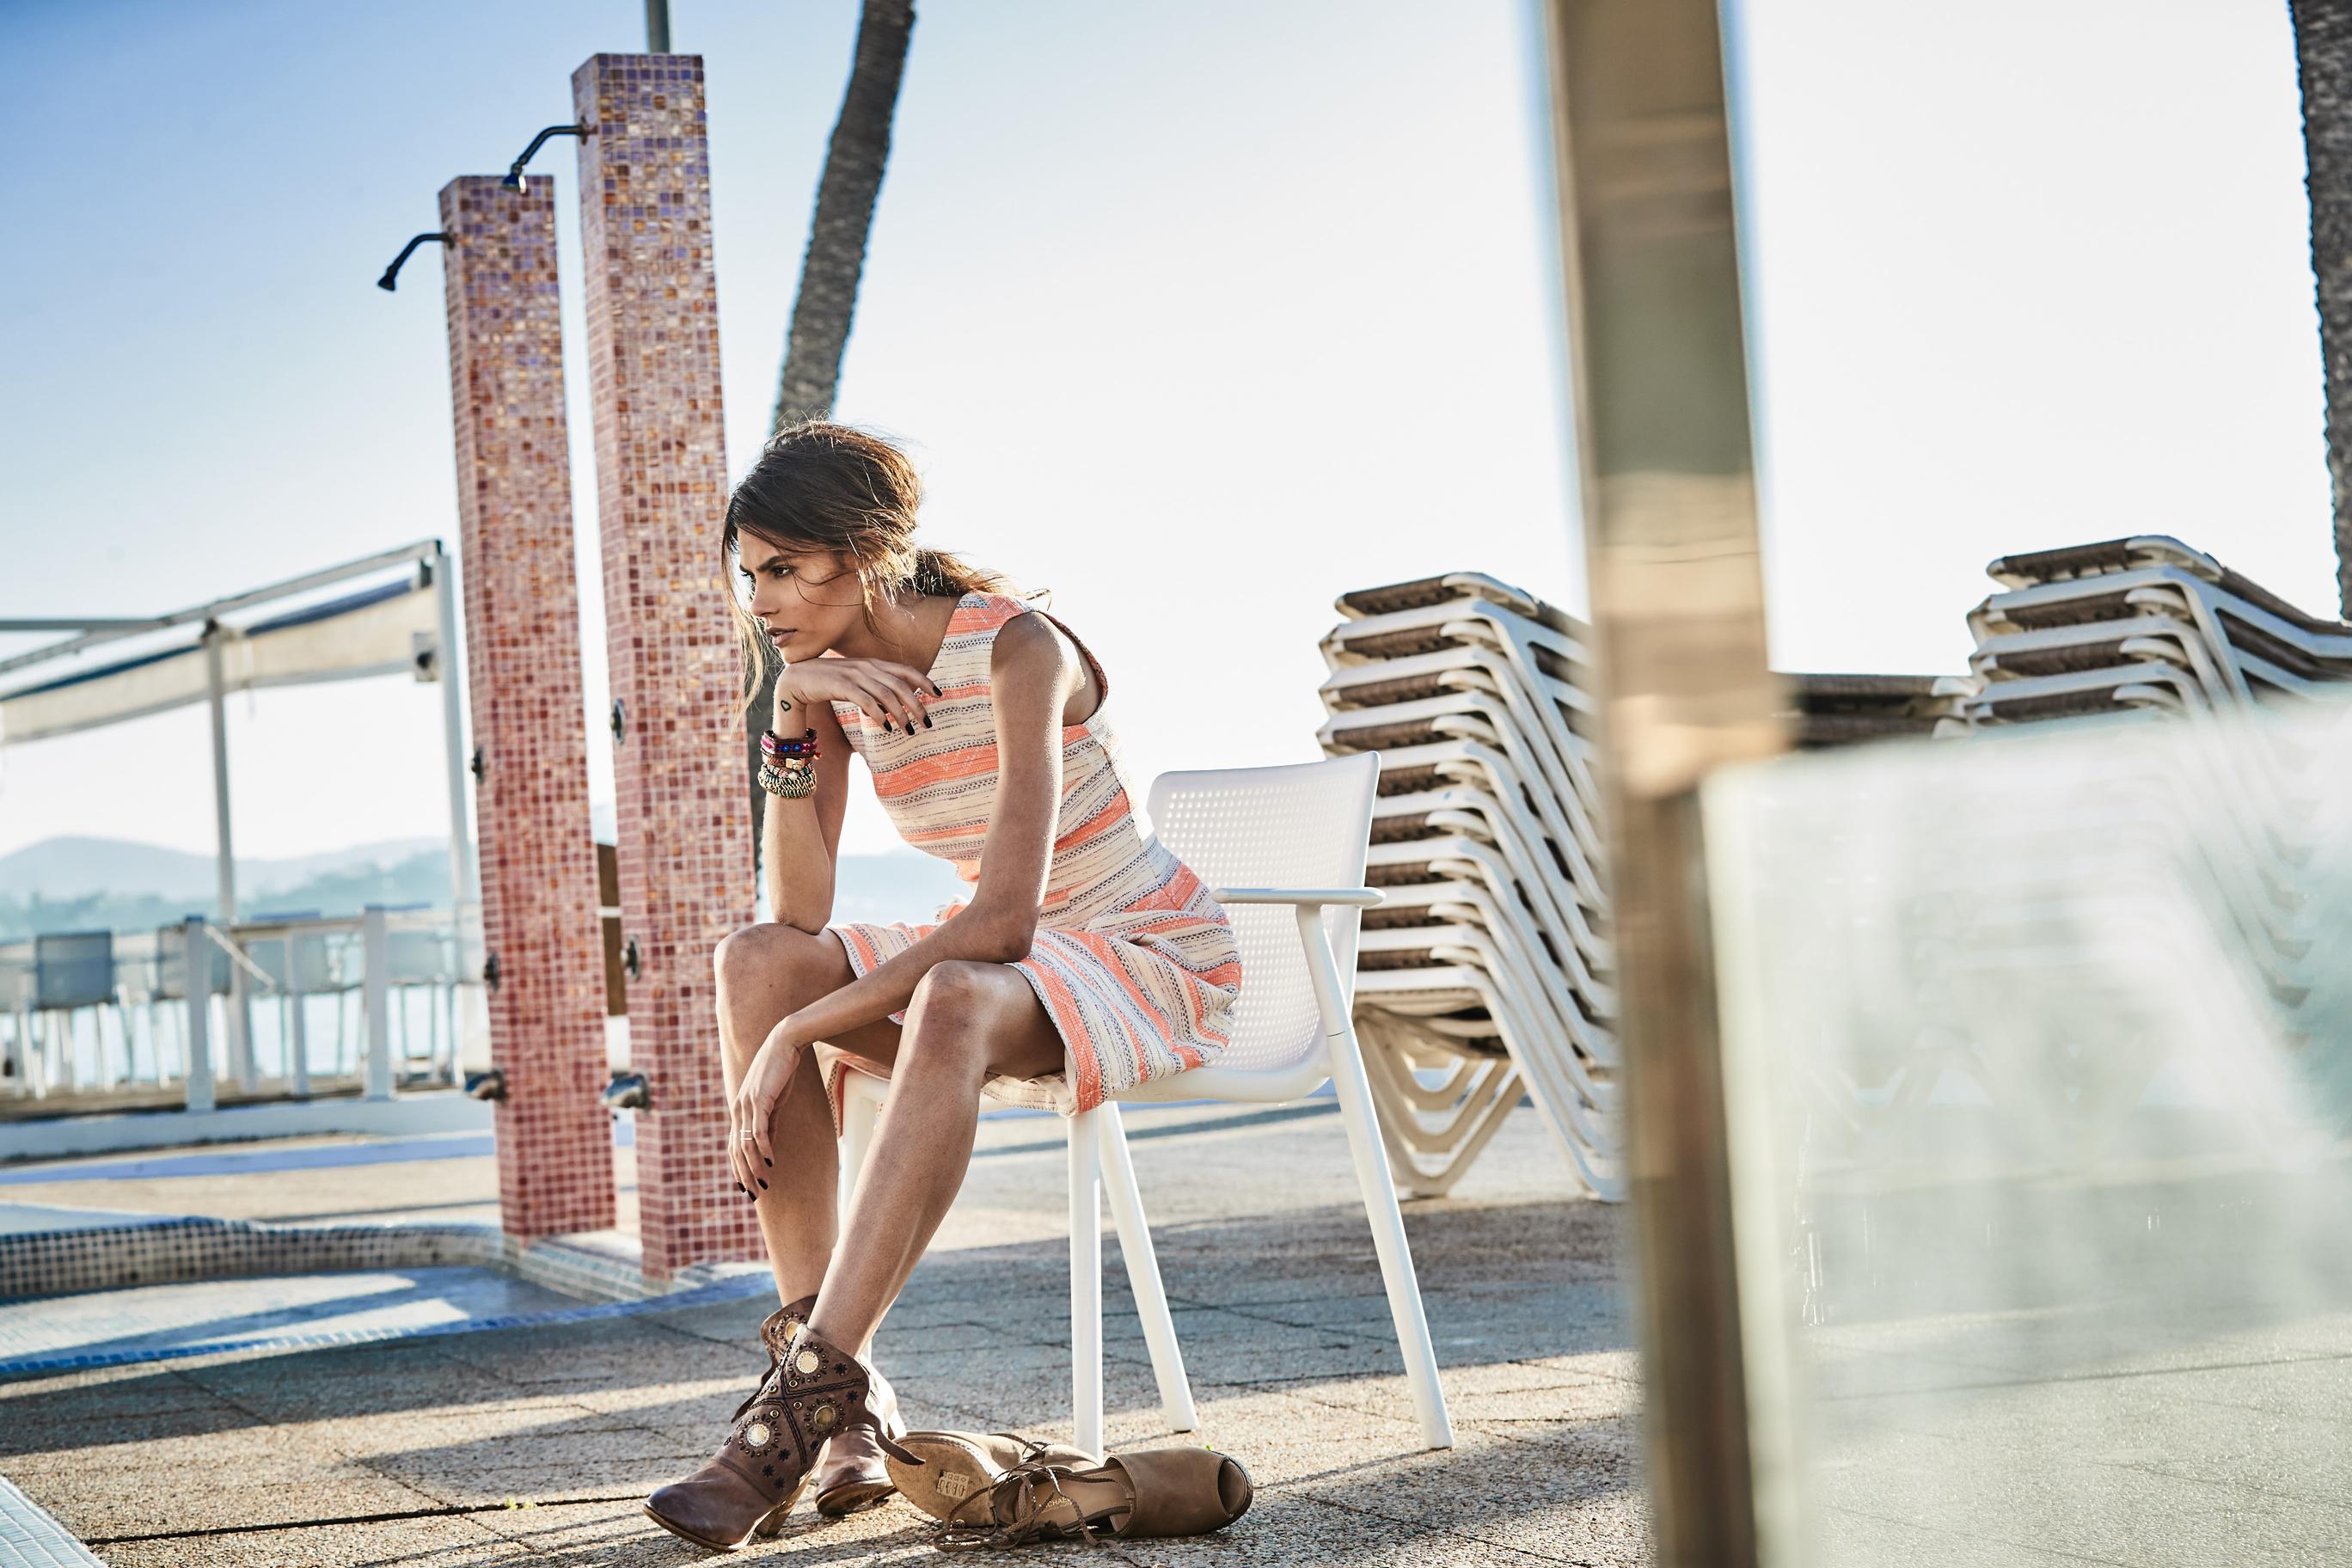 Summer_Fashion_B_01_Torsten_Ruppert.jpg